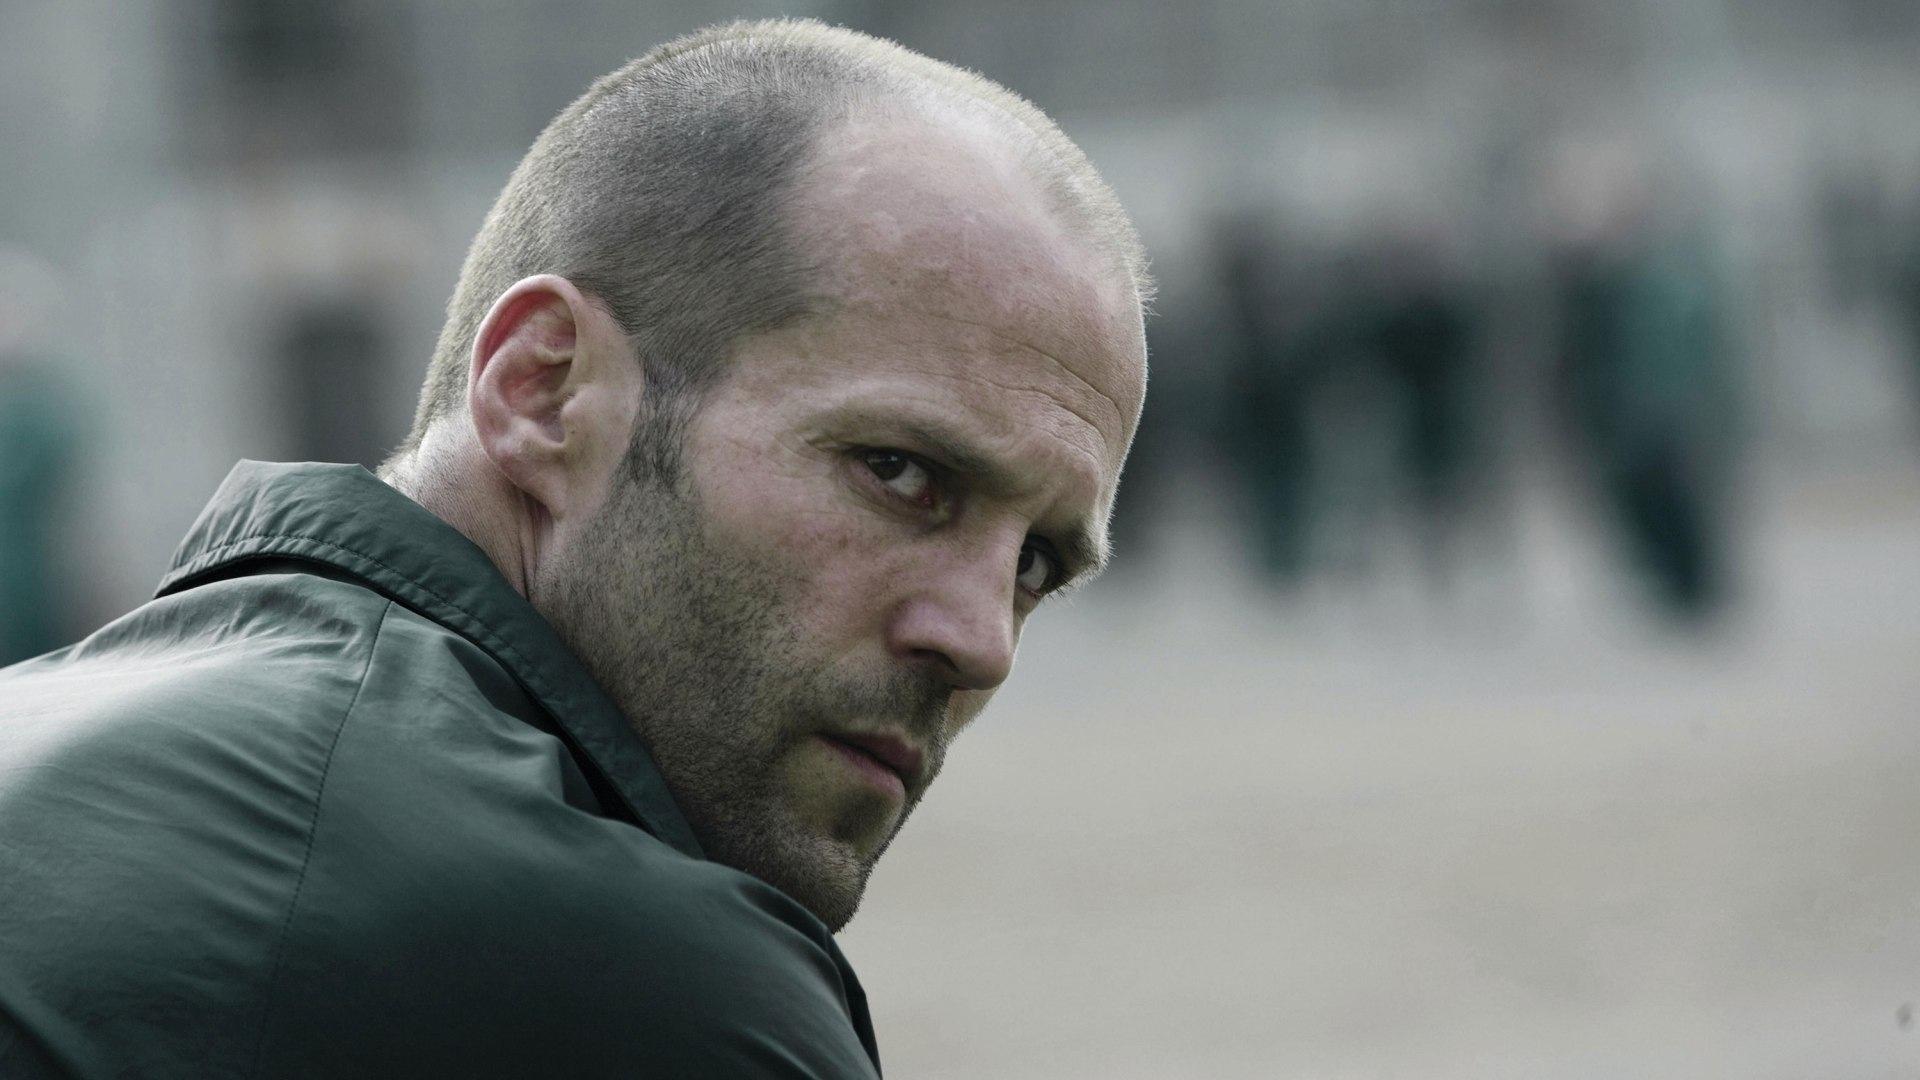 ec7a4351f7 Jason Statham look face actor celebrity